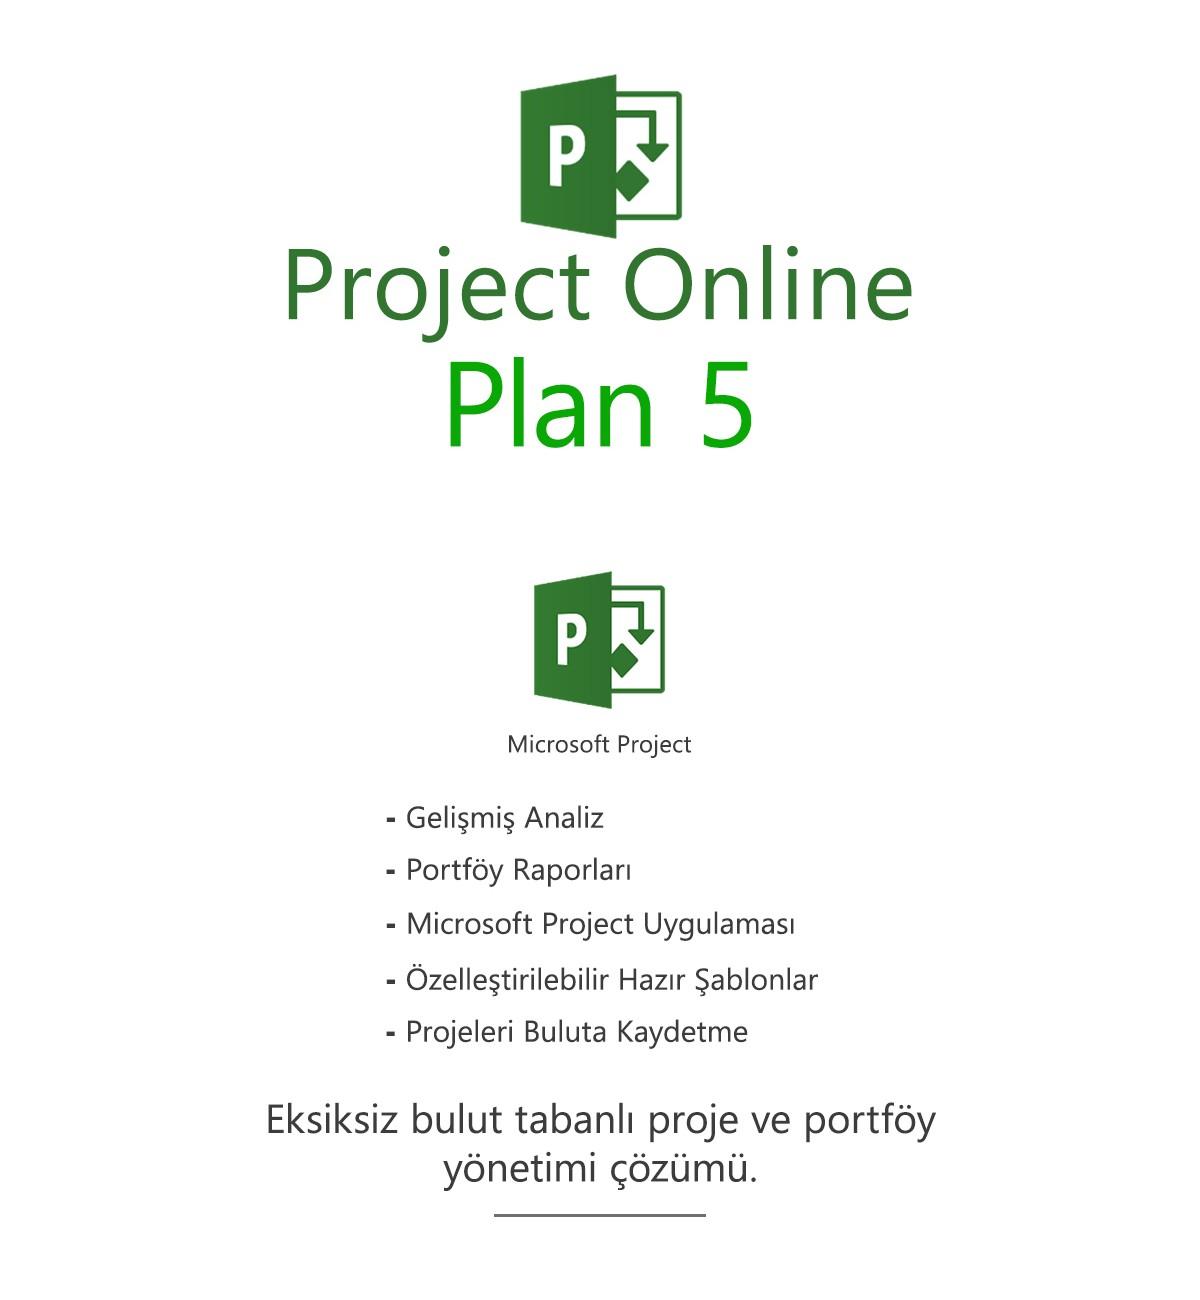 Project Online Plan 5